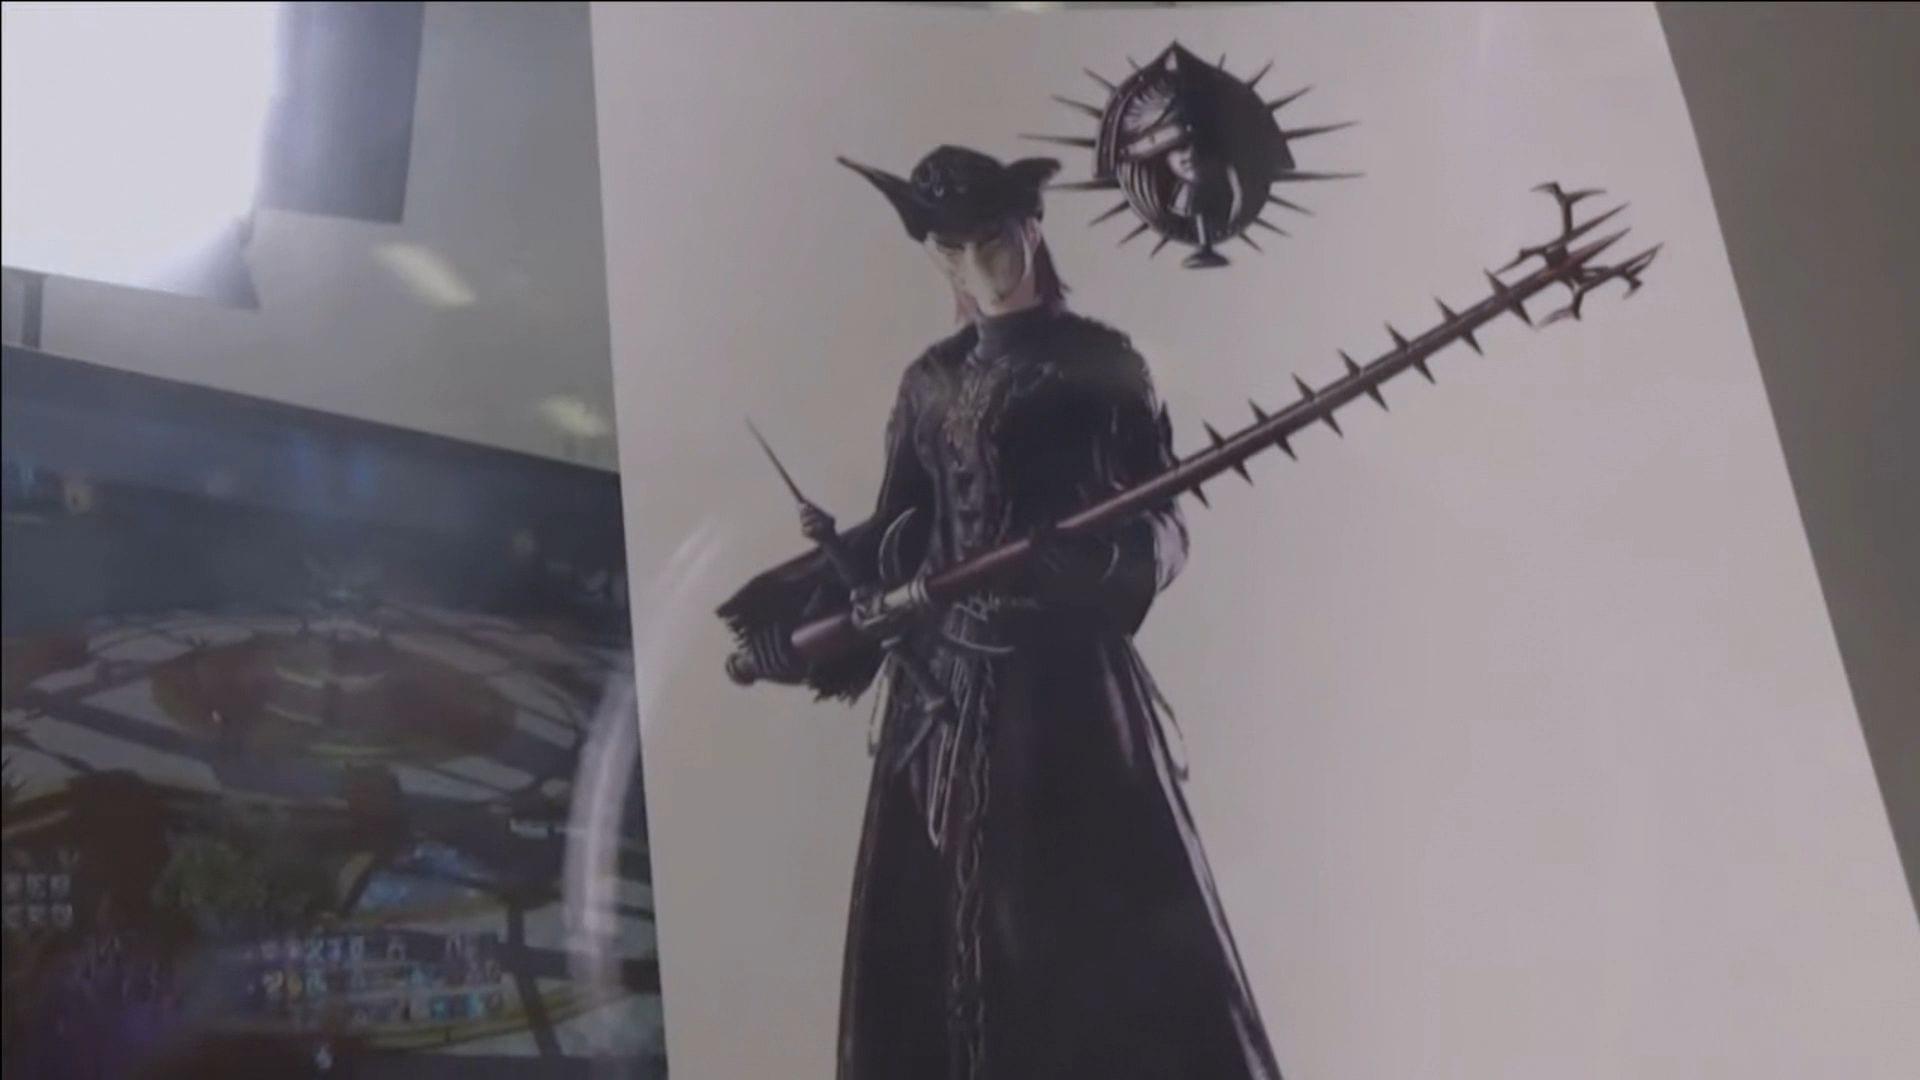 Final-Fantasy-XIV-Screenshot-2020-11-27-13-40-30.jpg?ssl=1